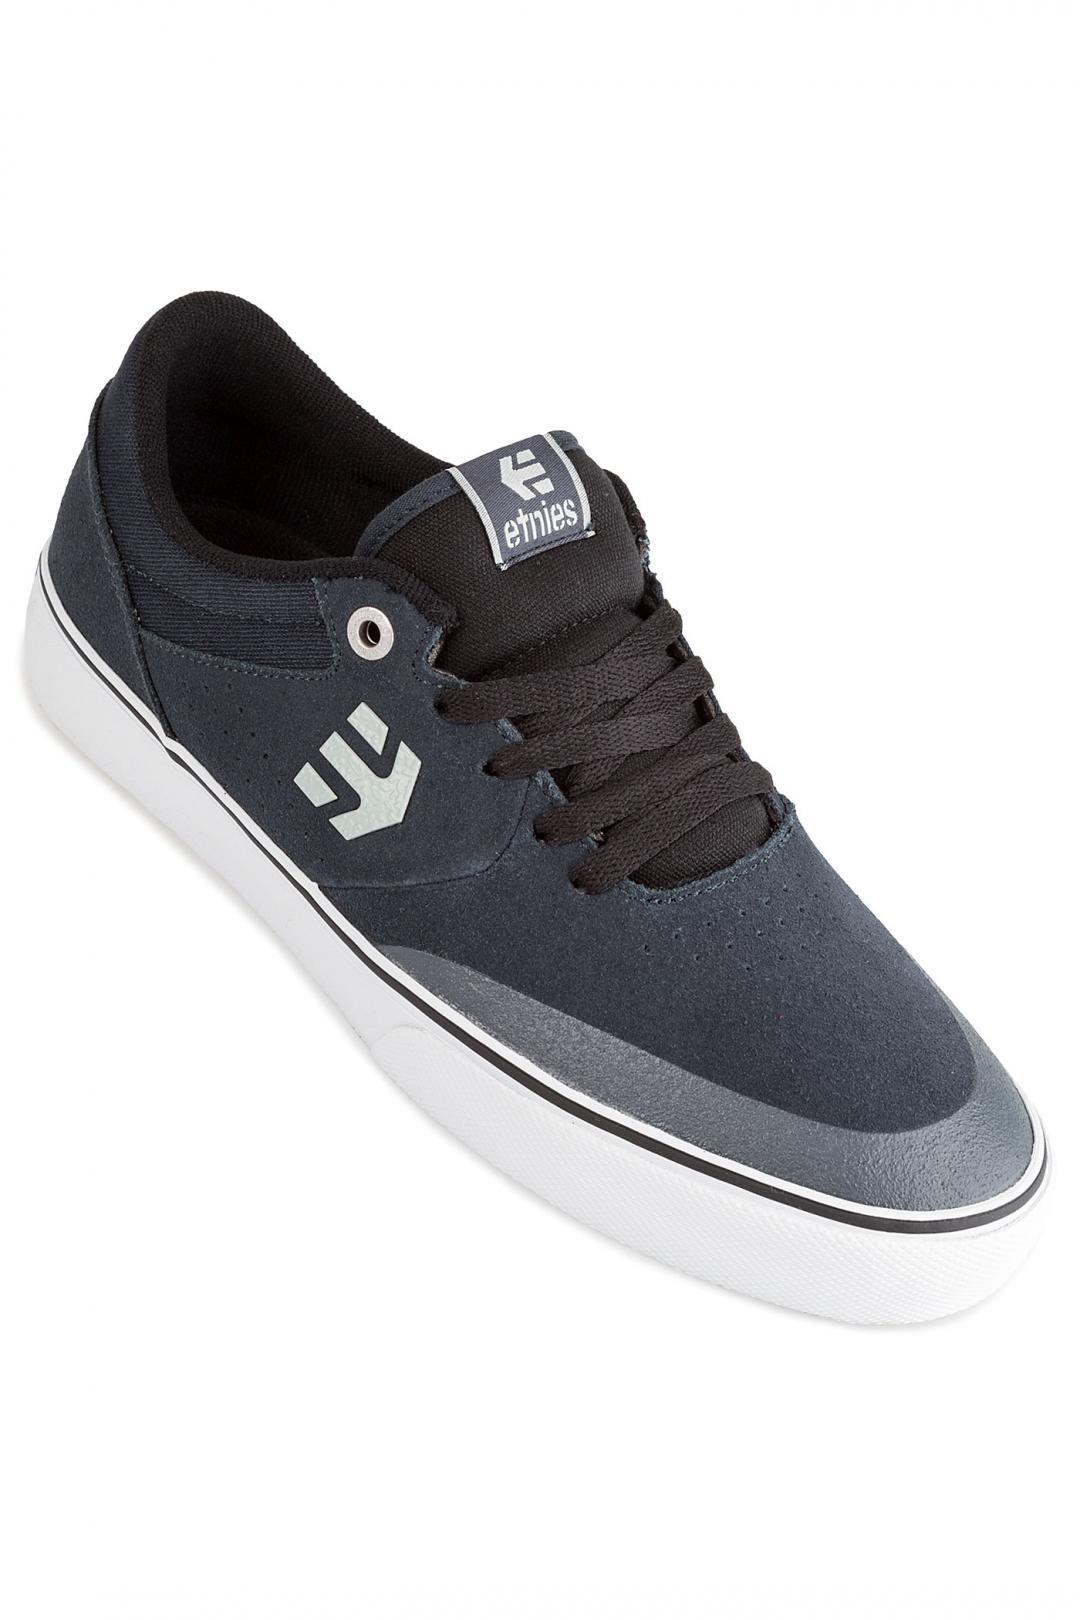 Uomo Etnies x Willow Marana Vulc charcoal | Sneakers low top